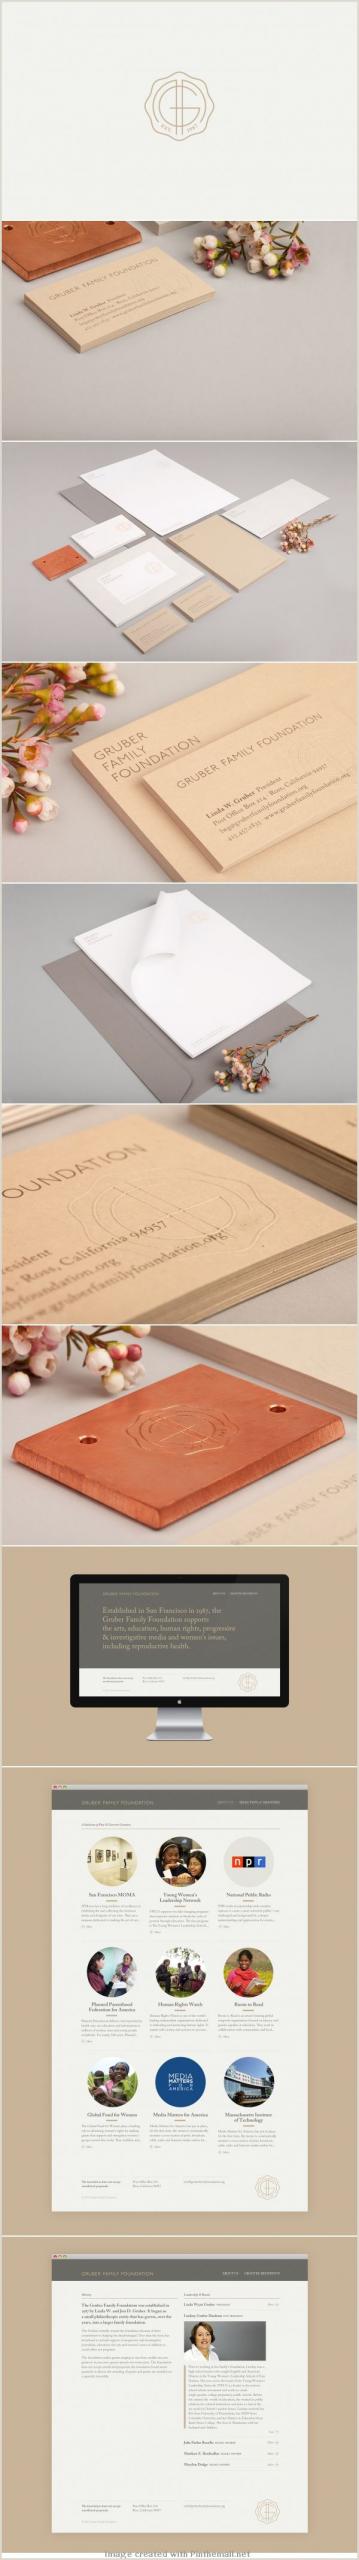 Best Business Cards 0 Apr 14 Popular Hardwood Flooring Business Card Template